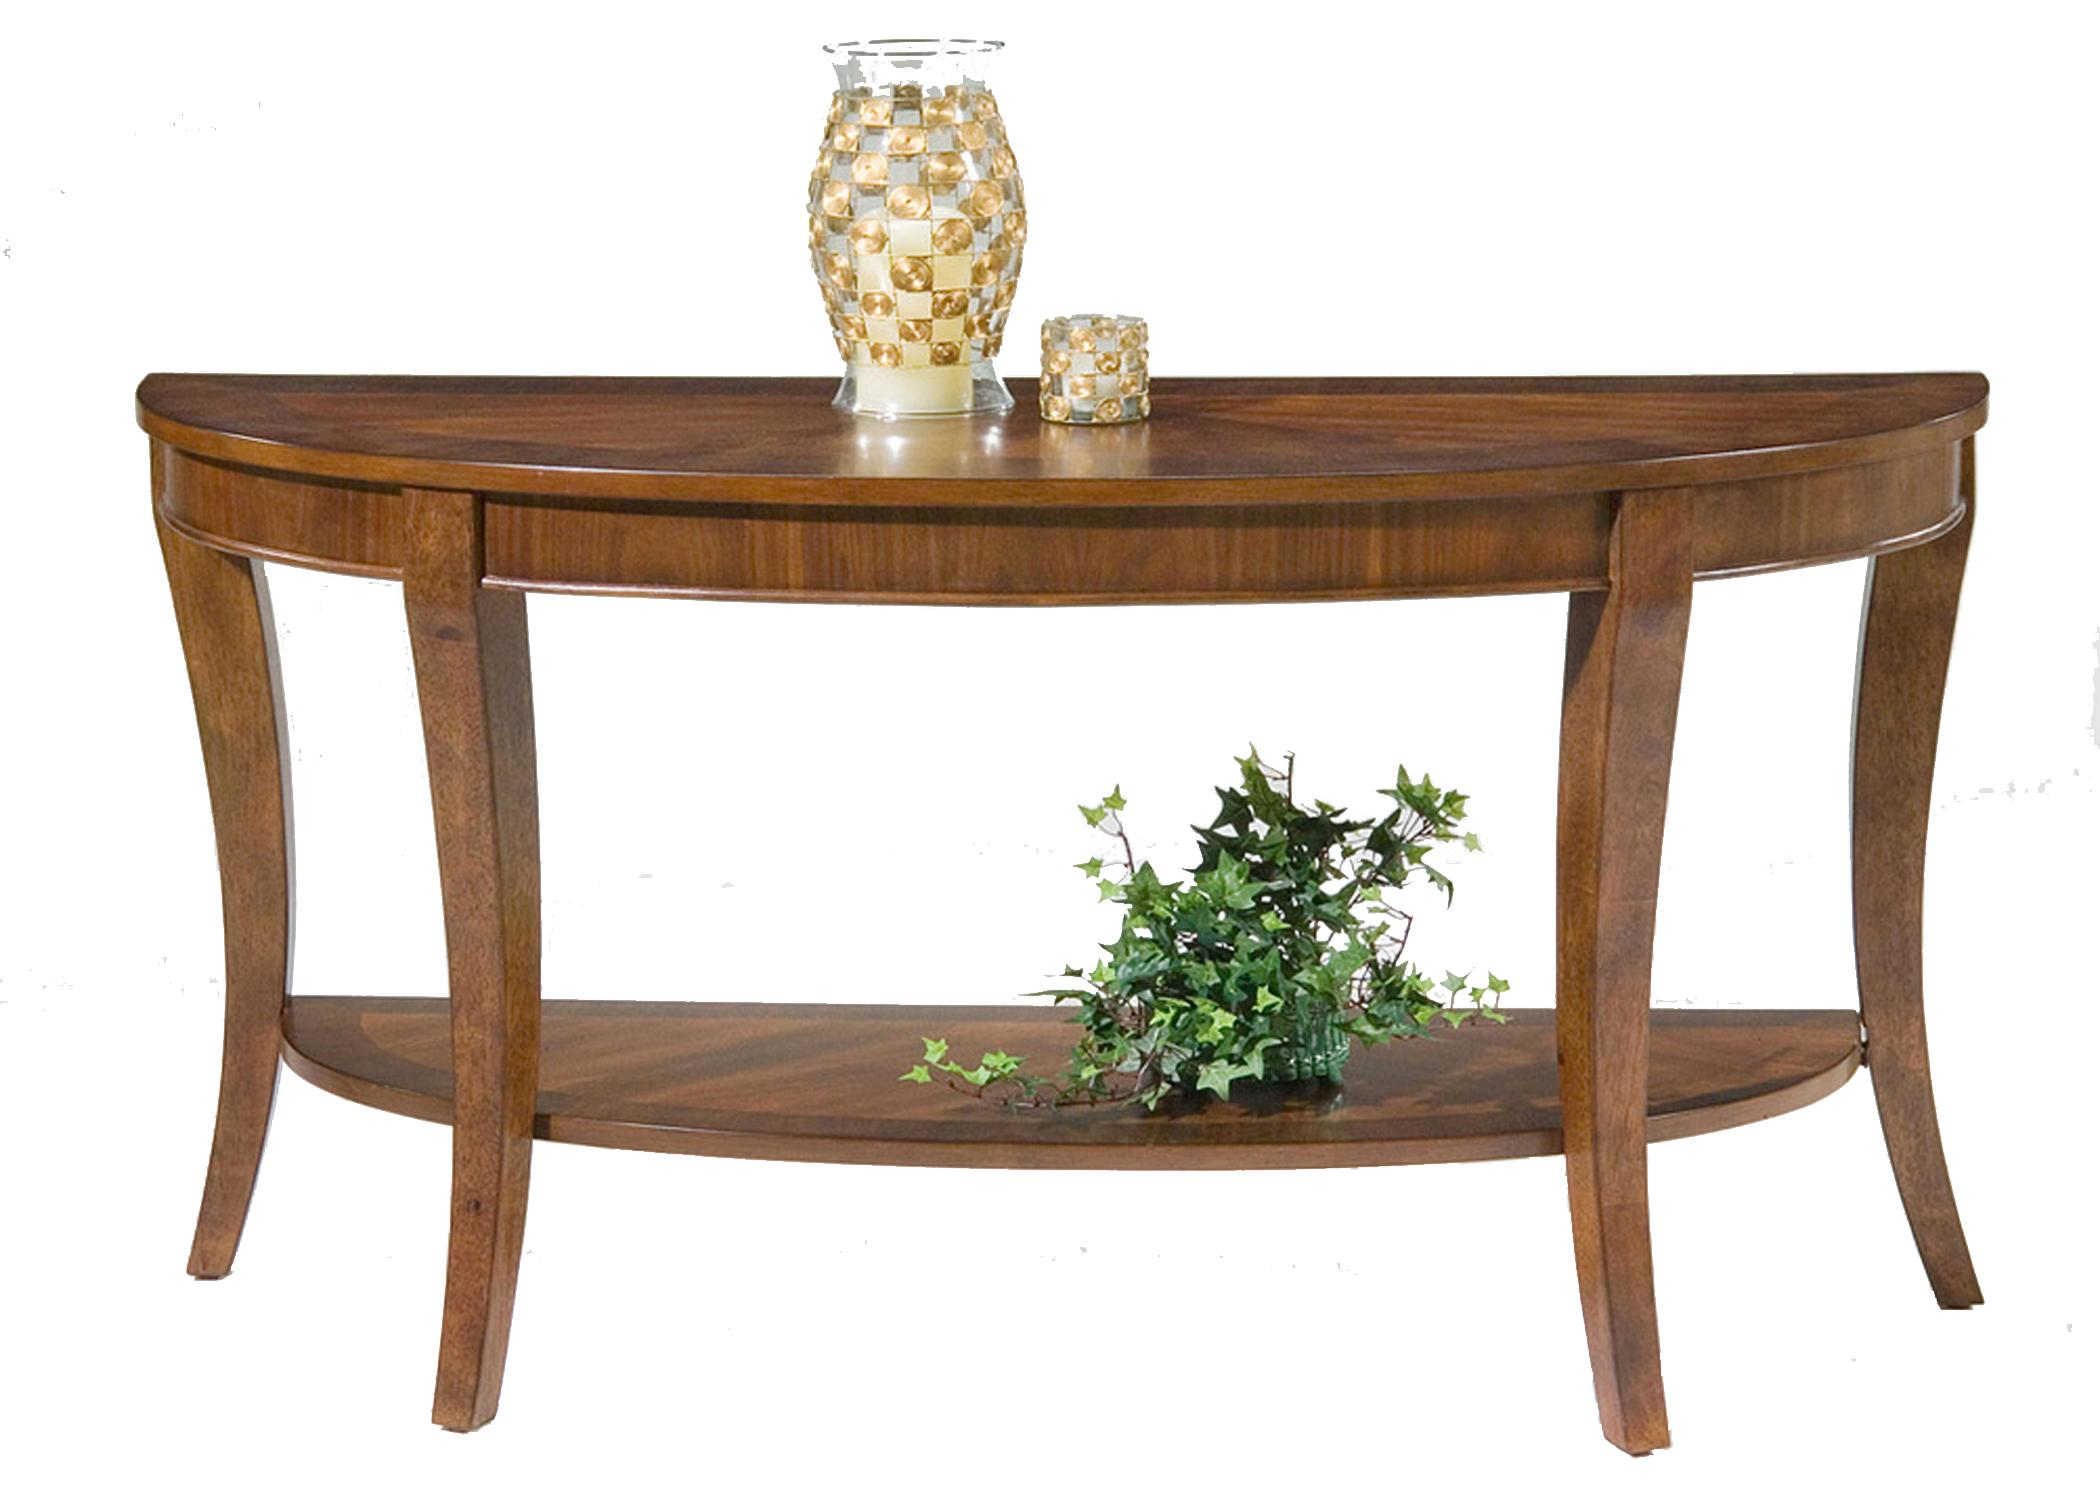 Liberty Furniture Bradshaw Sofa Table - Item Number: 748-OT1030